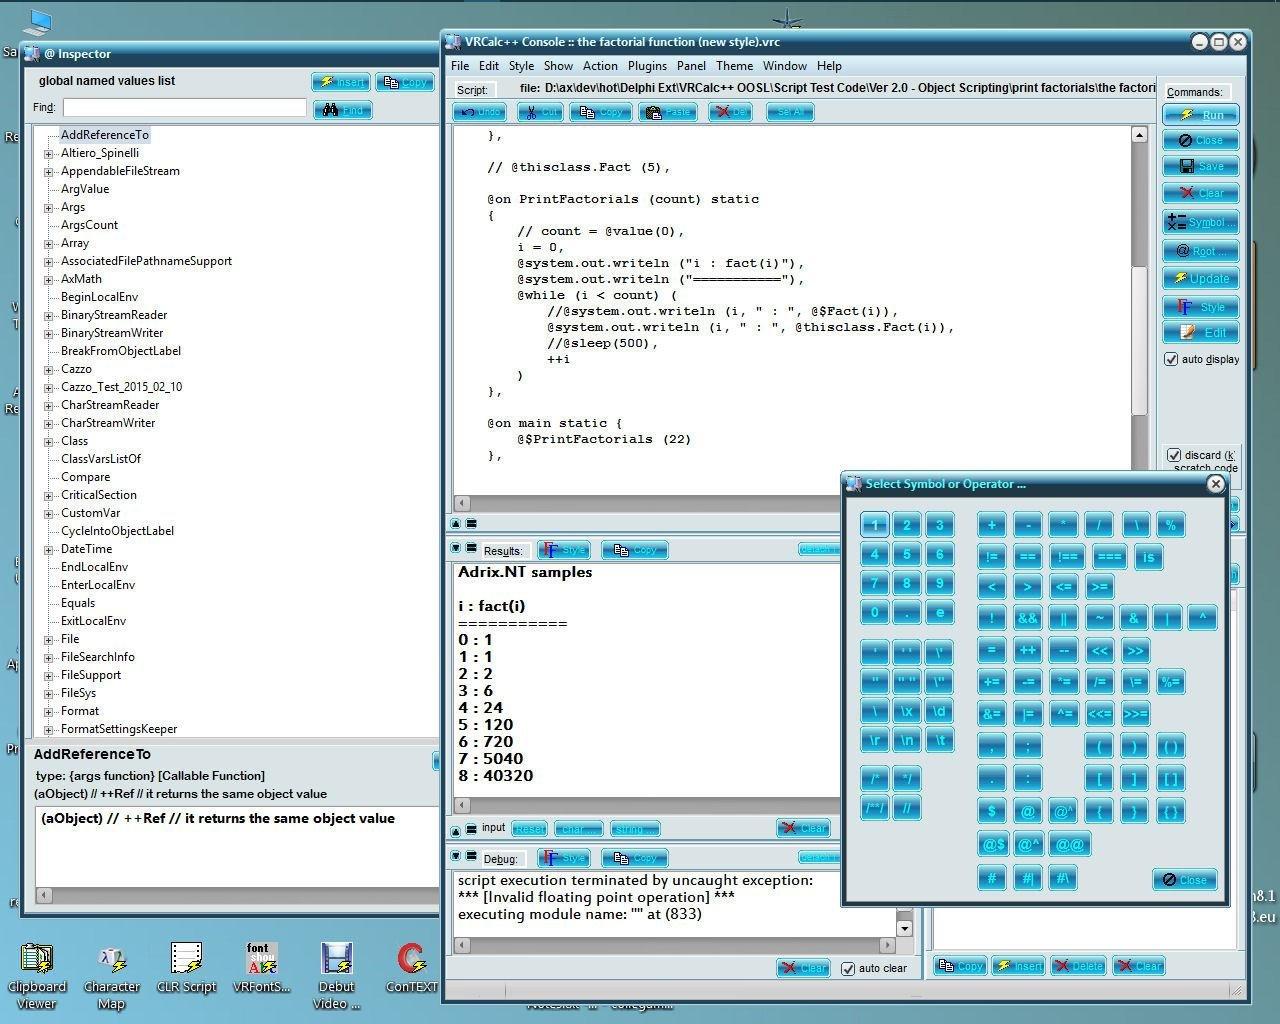 Roblox Script Executor Source Code - Roblox Hack Commands